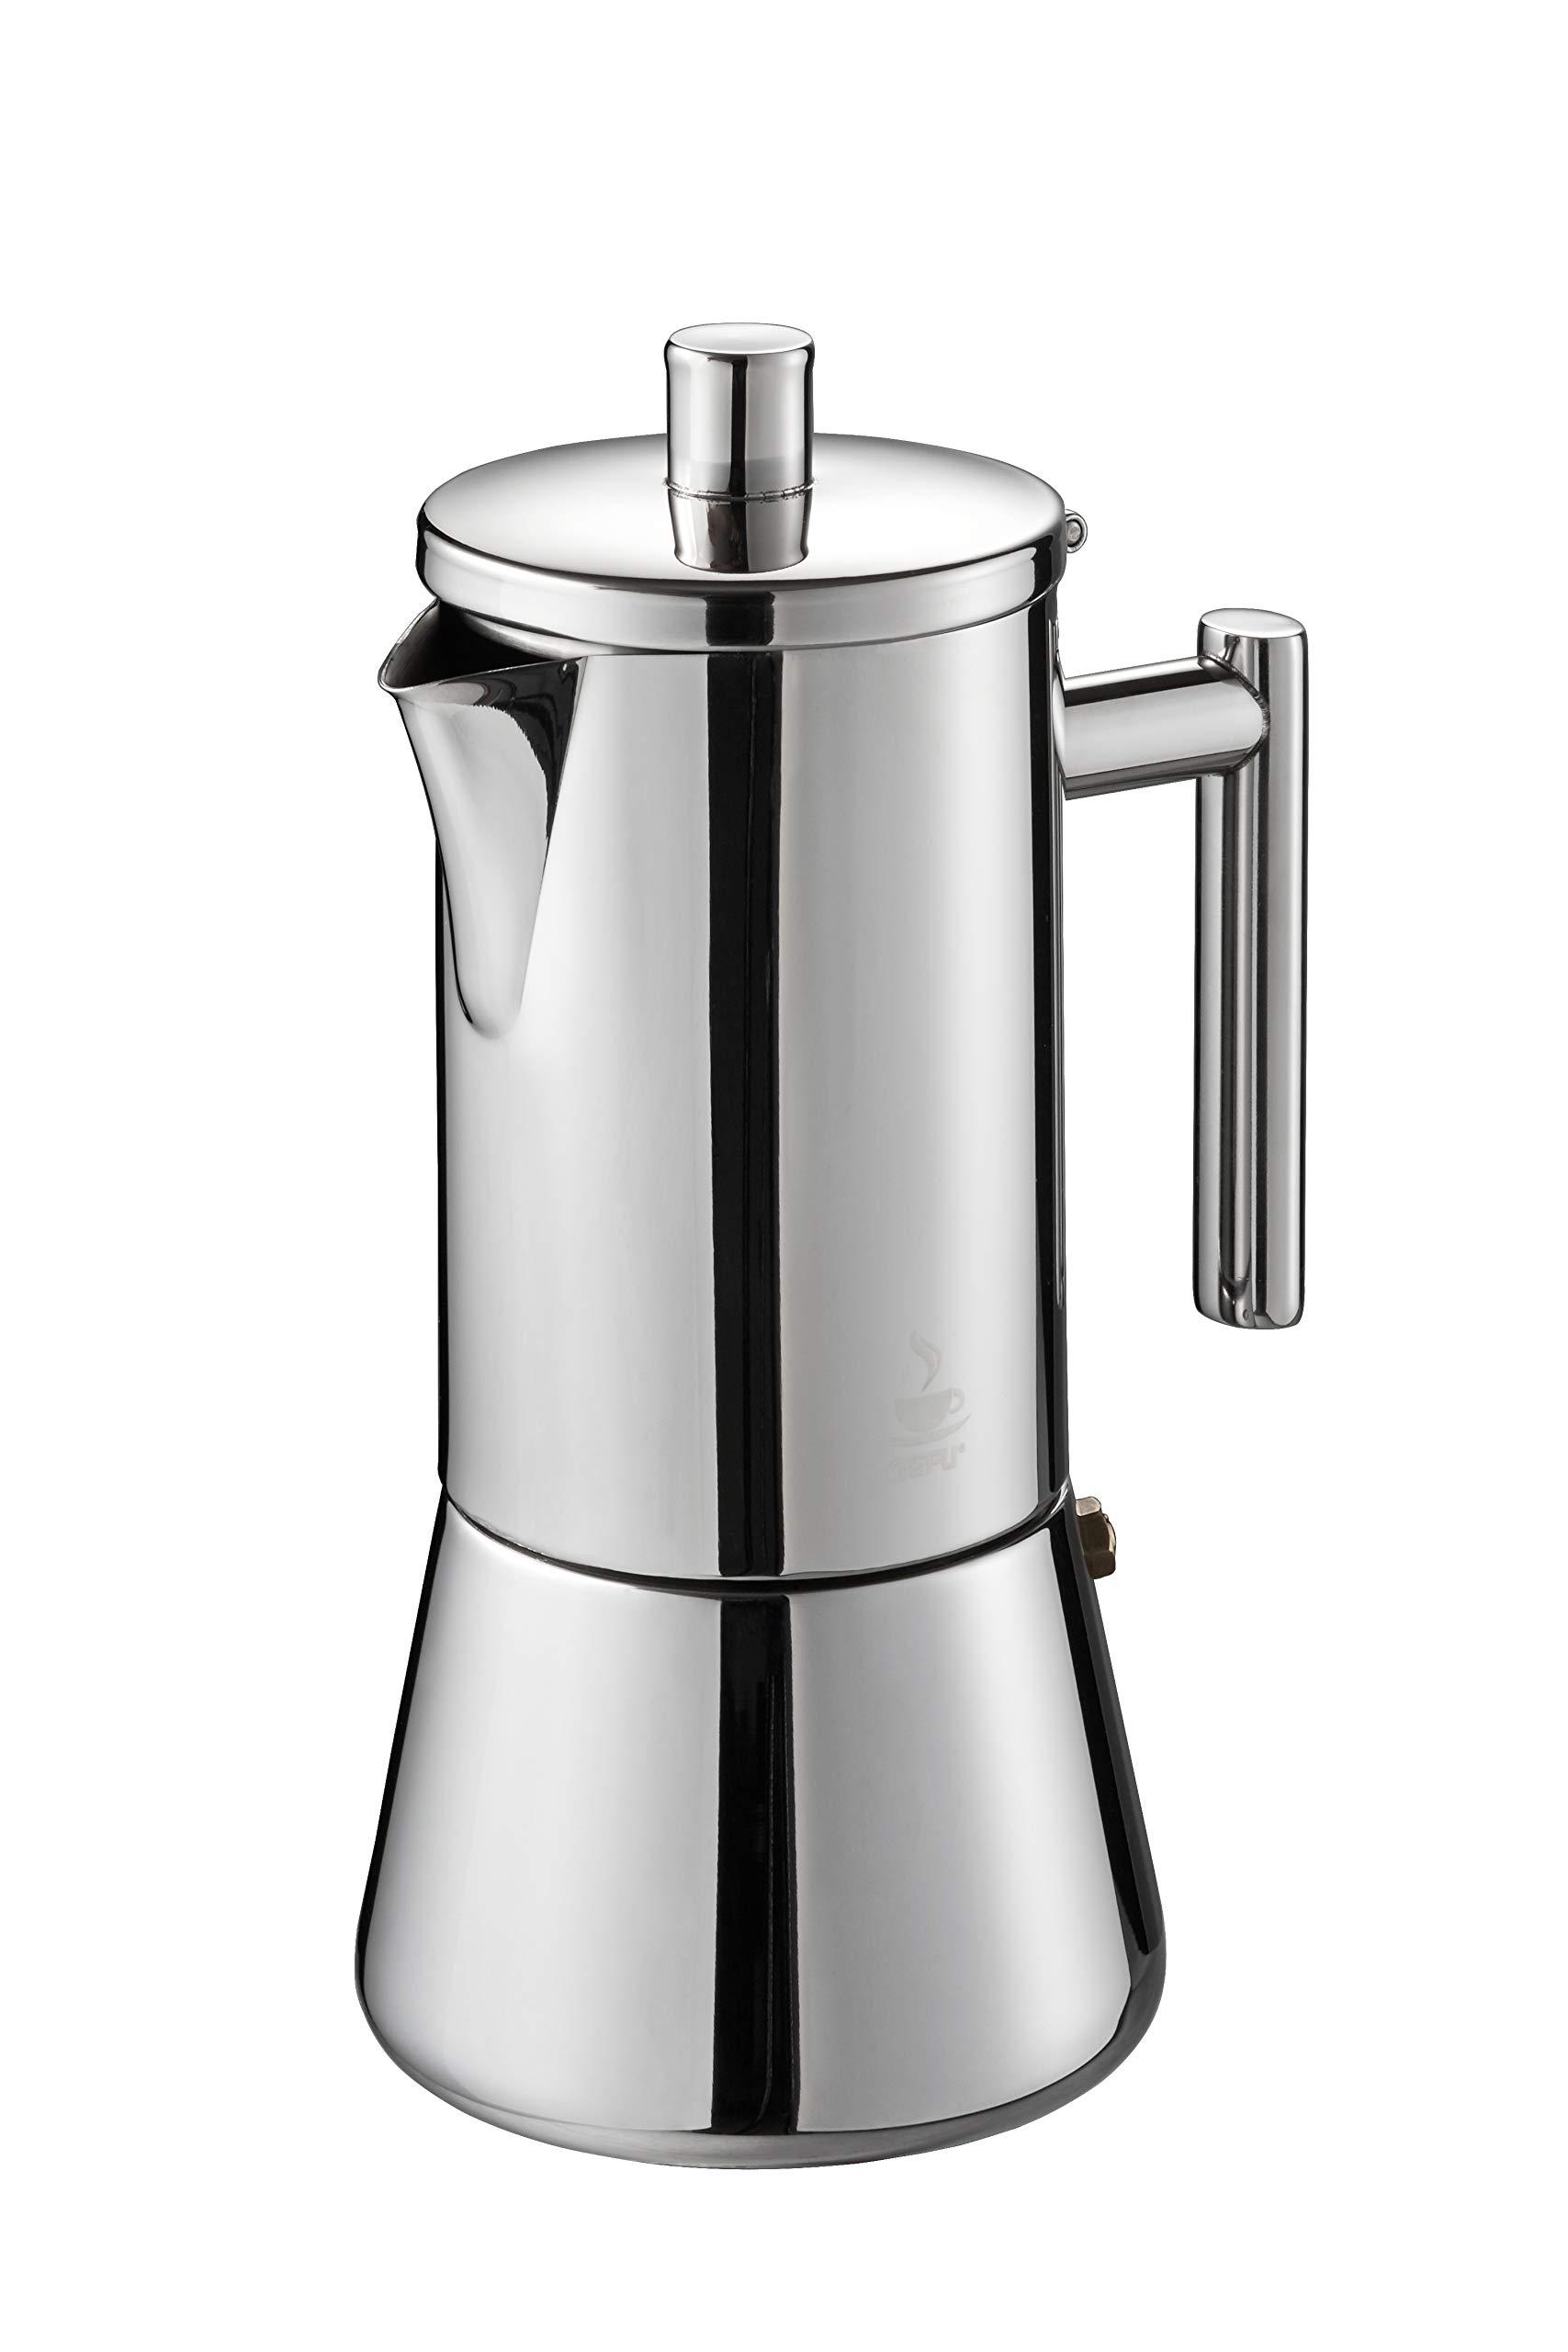 GEFU Espresso Maker 4 Cups Nando by GEFU